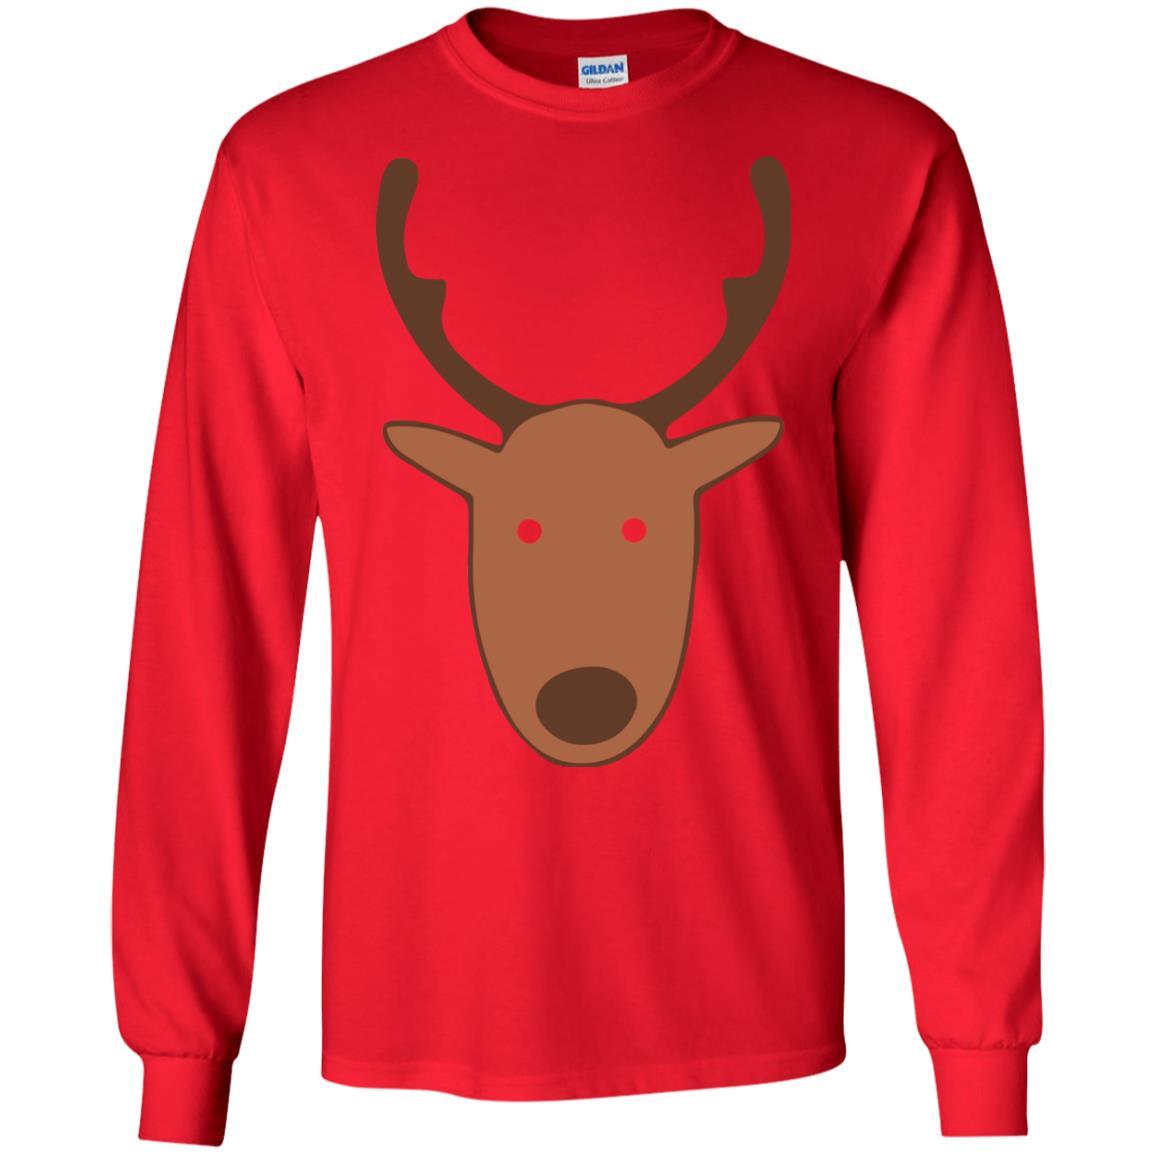 image 4769 - Tina Belcher Reindeer Christmas Sweater, Shirt, Hoodie